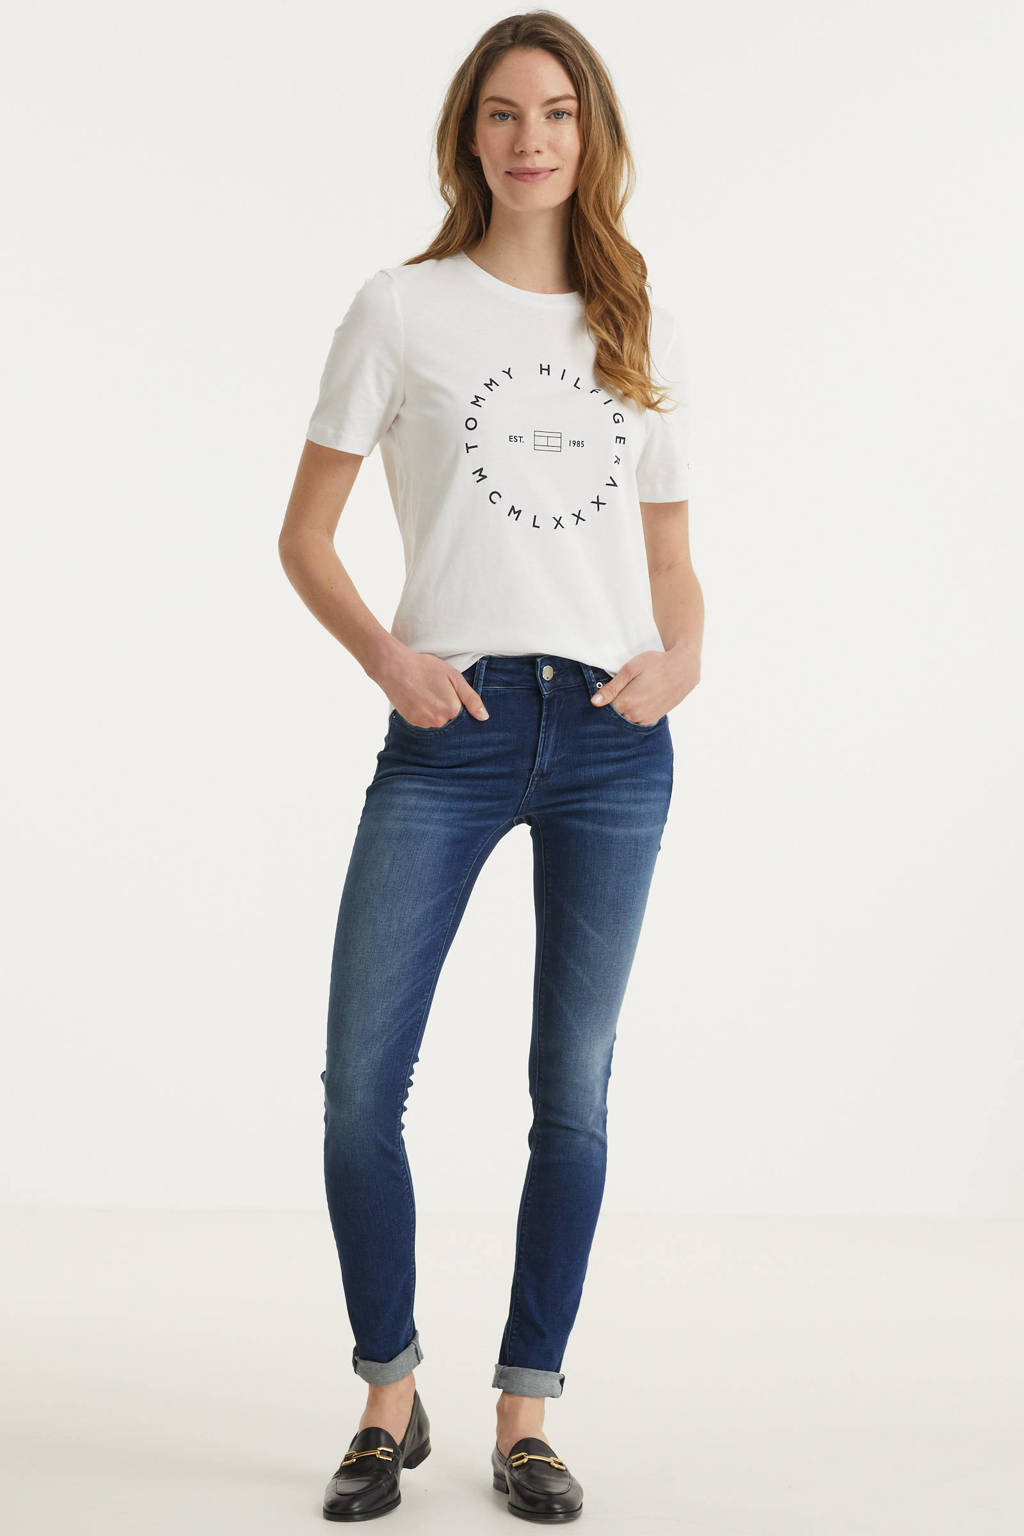 REPLAY skinny jeans NEW LUZ stonewashed, Medium blue